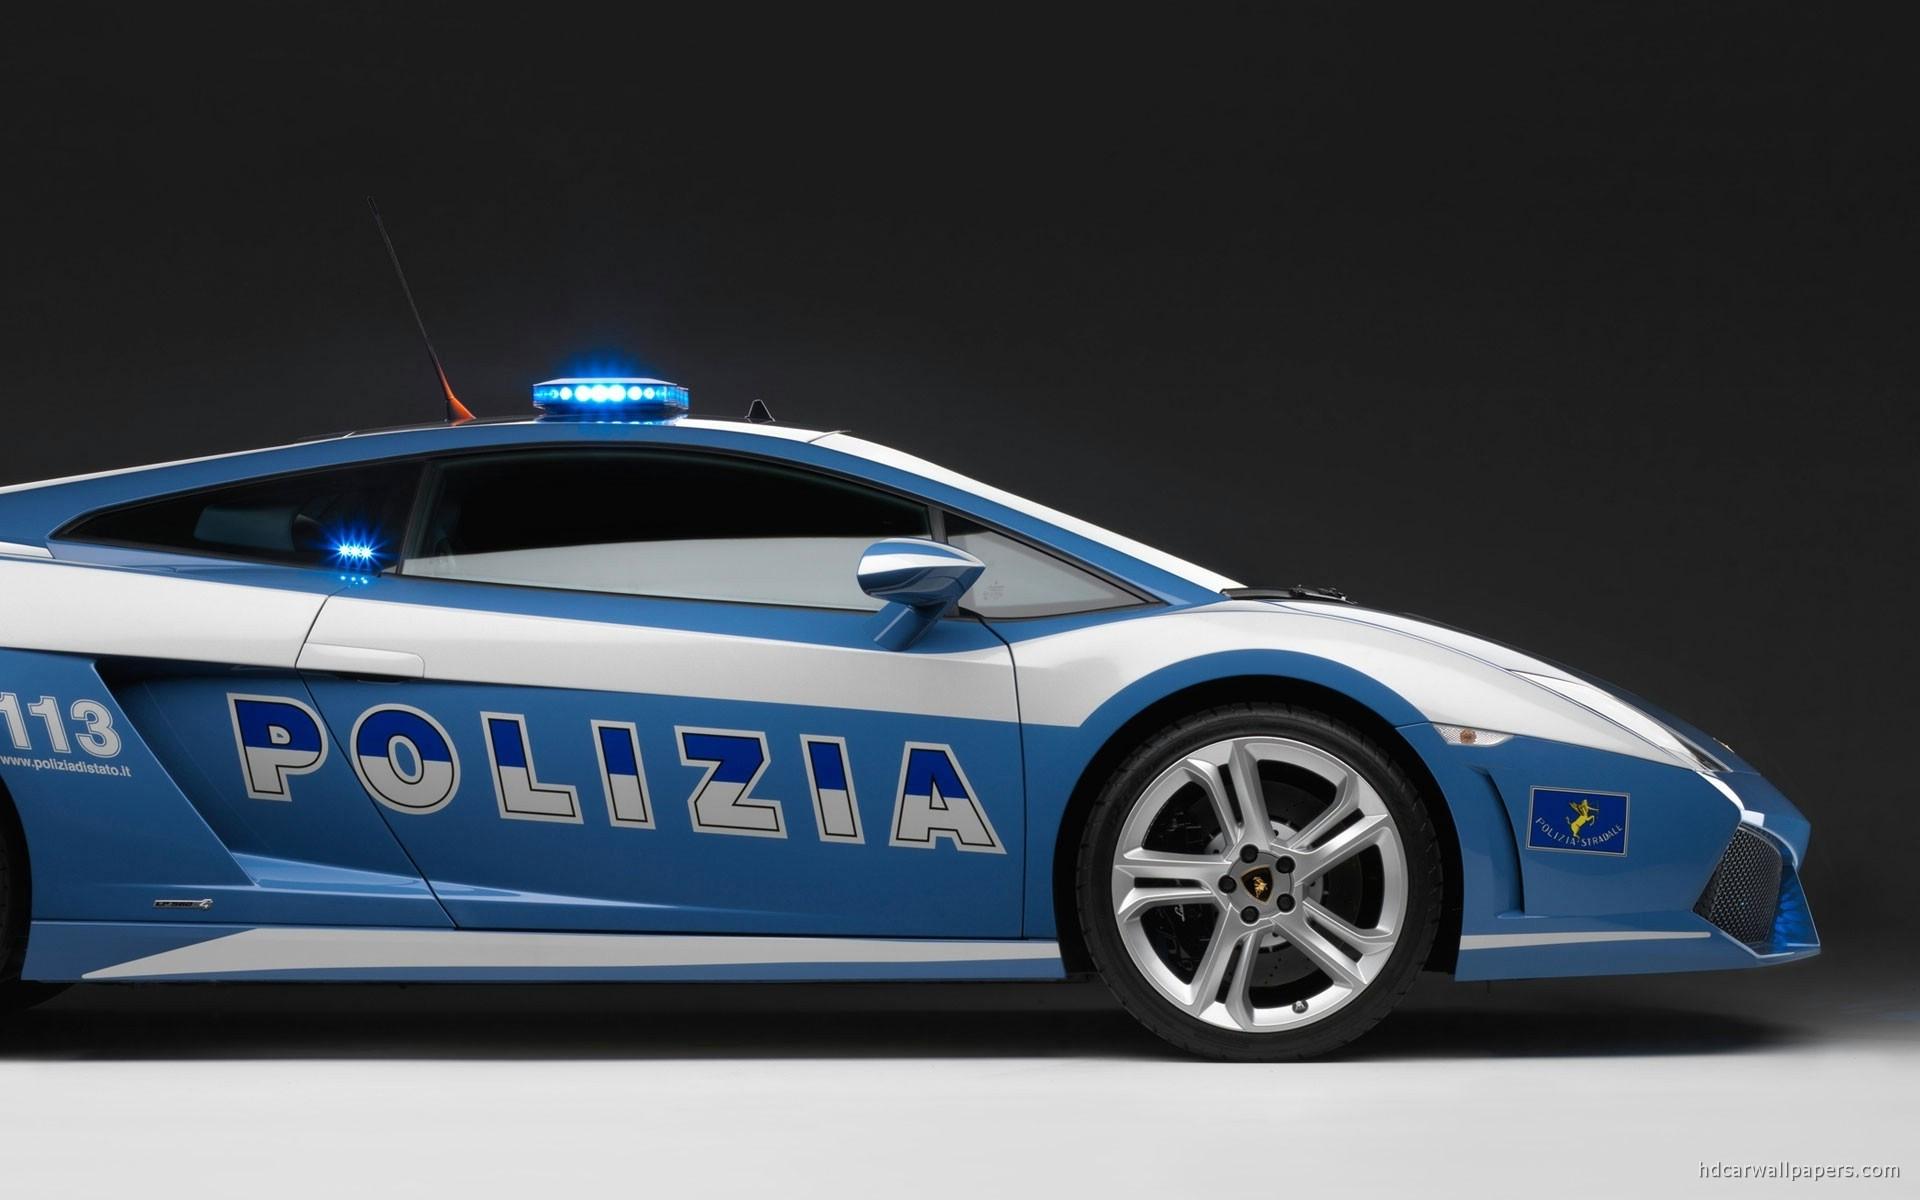 2009 Lamborghini Police Car Wallpaper in Resolution